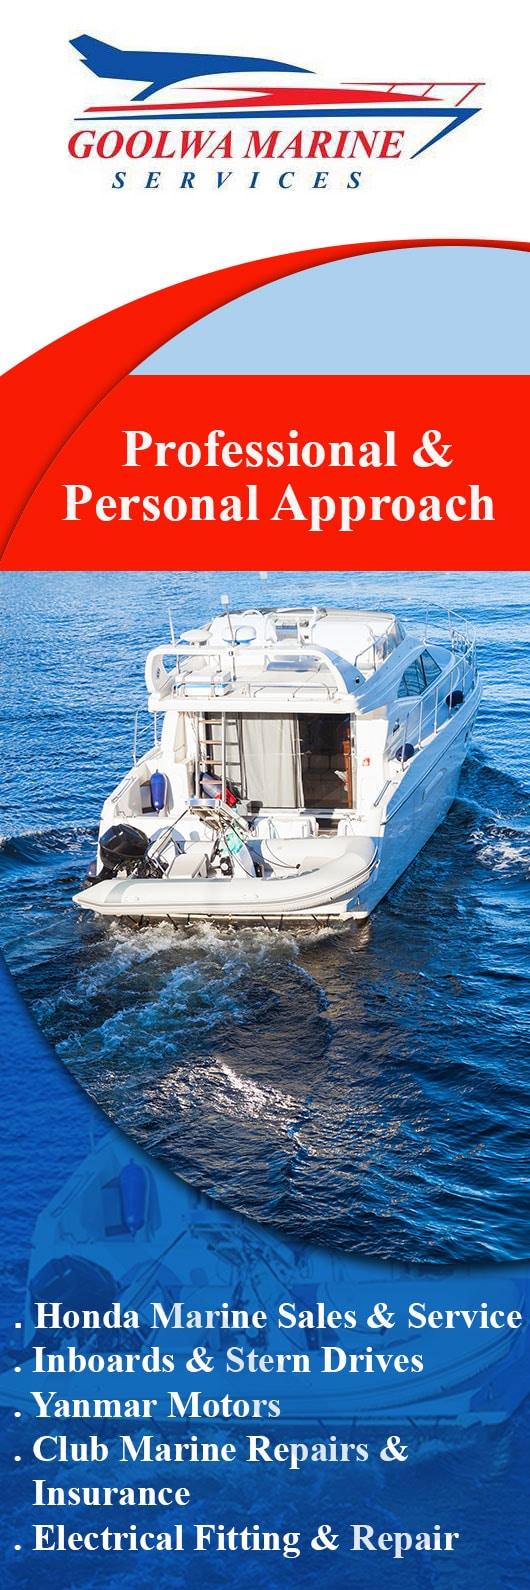 Goolwa Marine Services - Boat Motors & Outboards - Tolarno